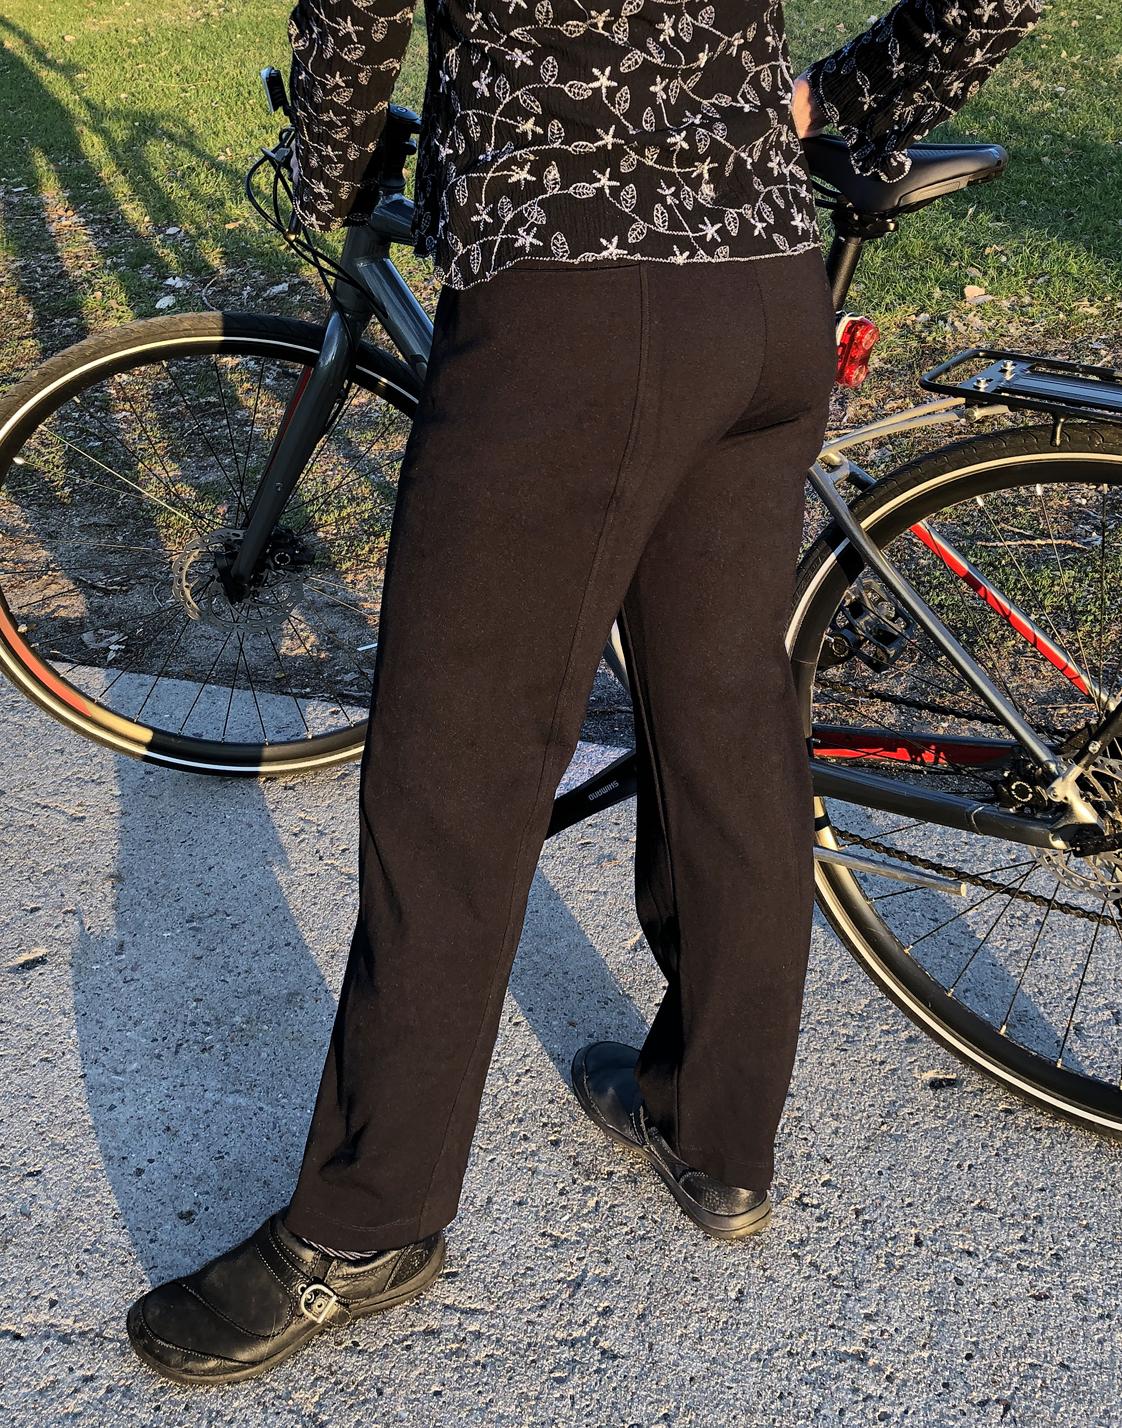 Porus Pants in Black….at sunset :)